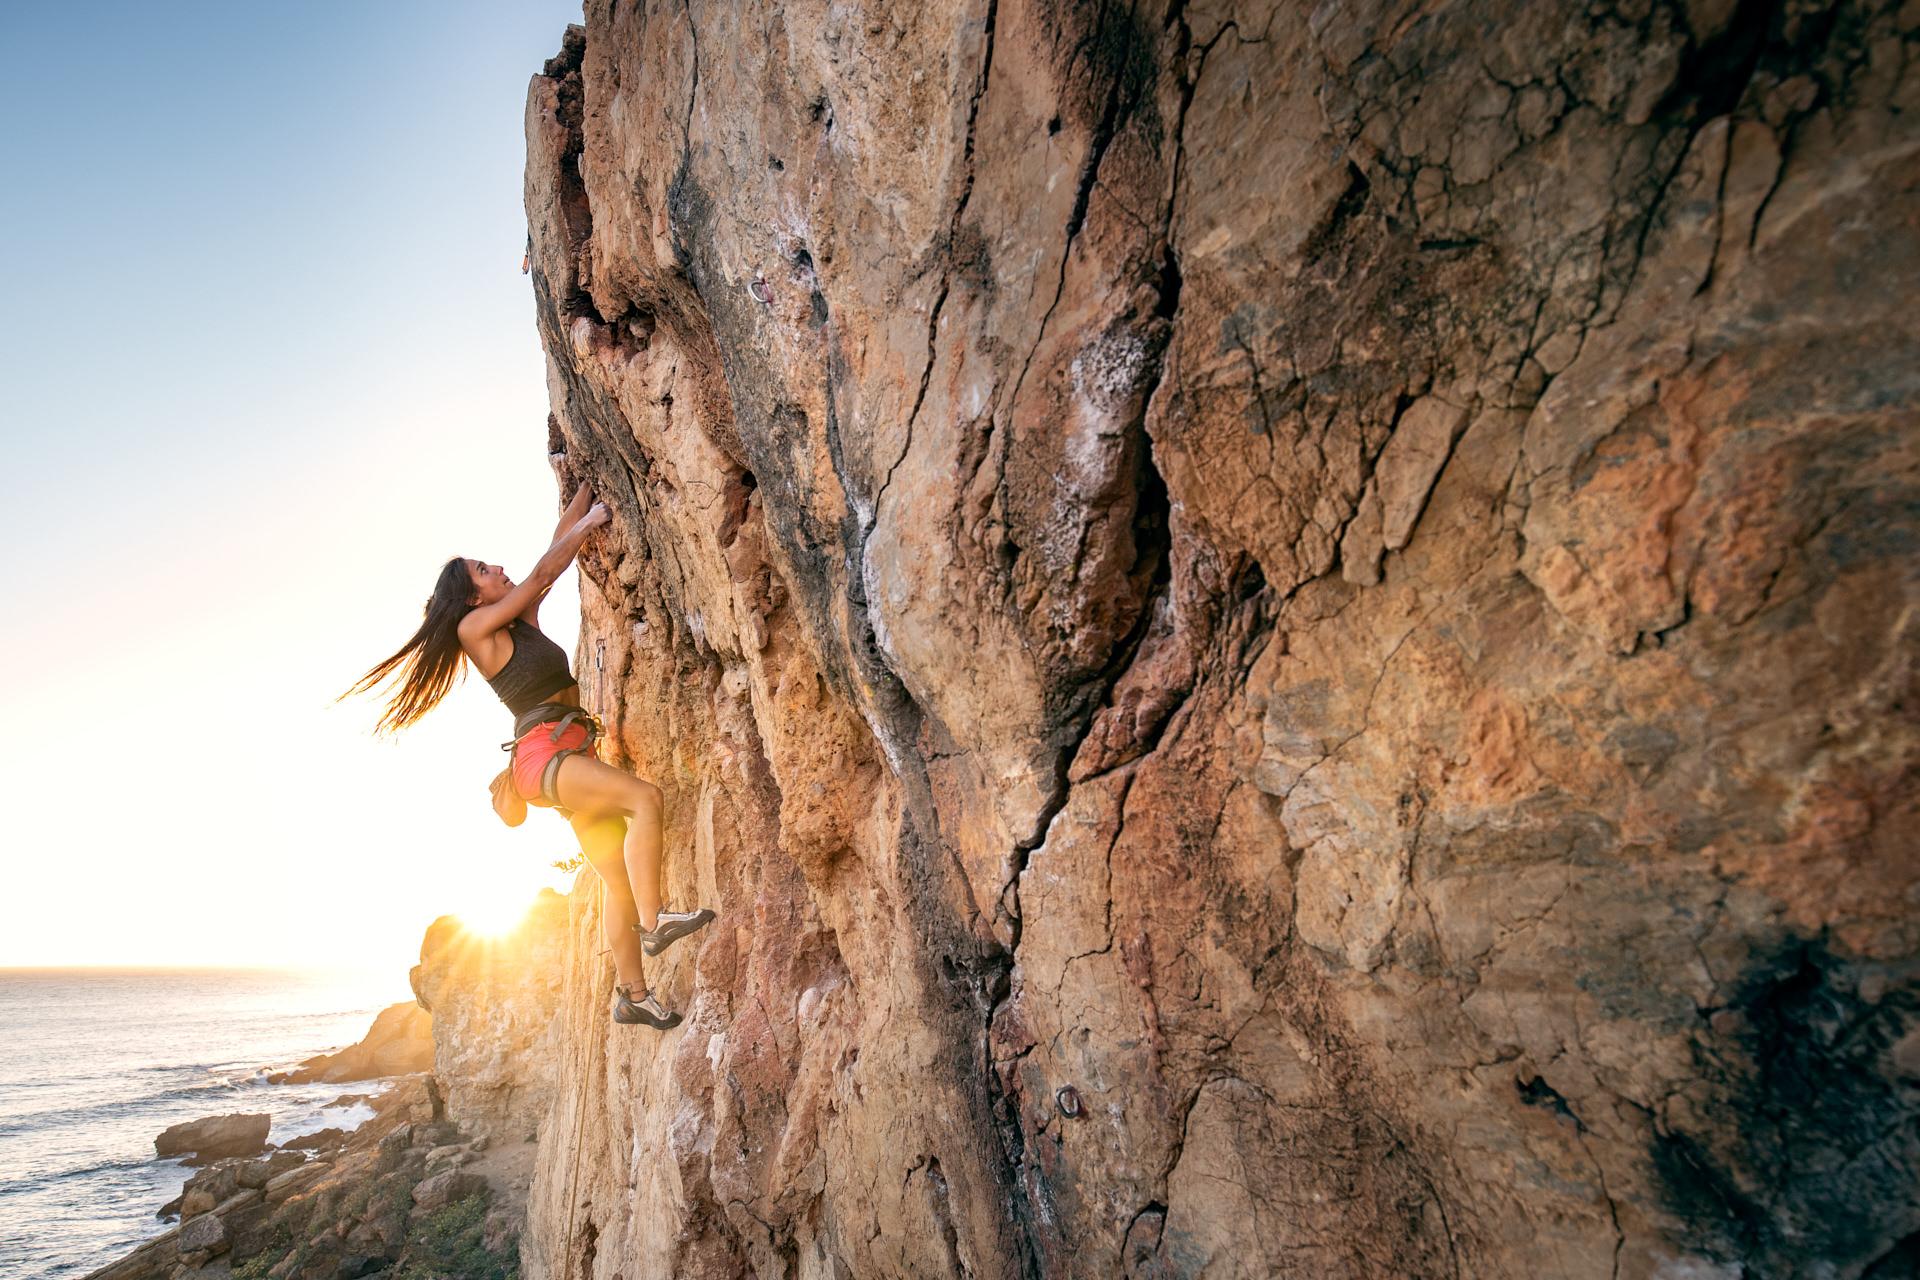 Lisbon Climbing Guide - Inês Azevedo climbing Caravela Virtual (V+) in Guia ©Martim Vidigal